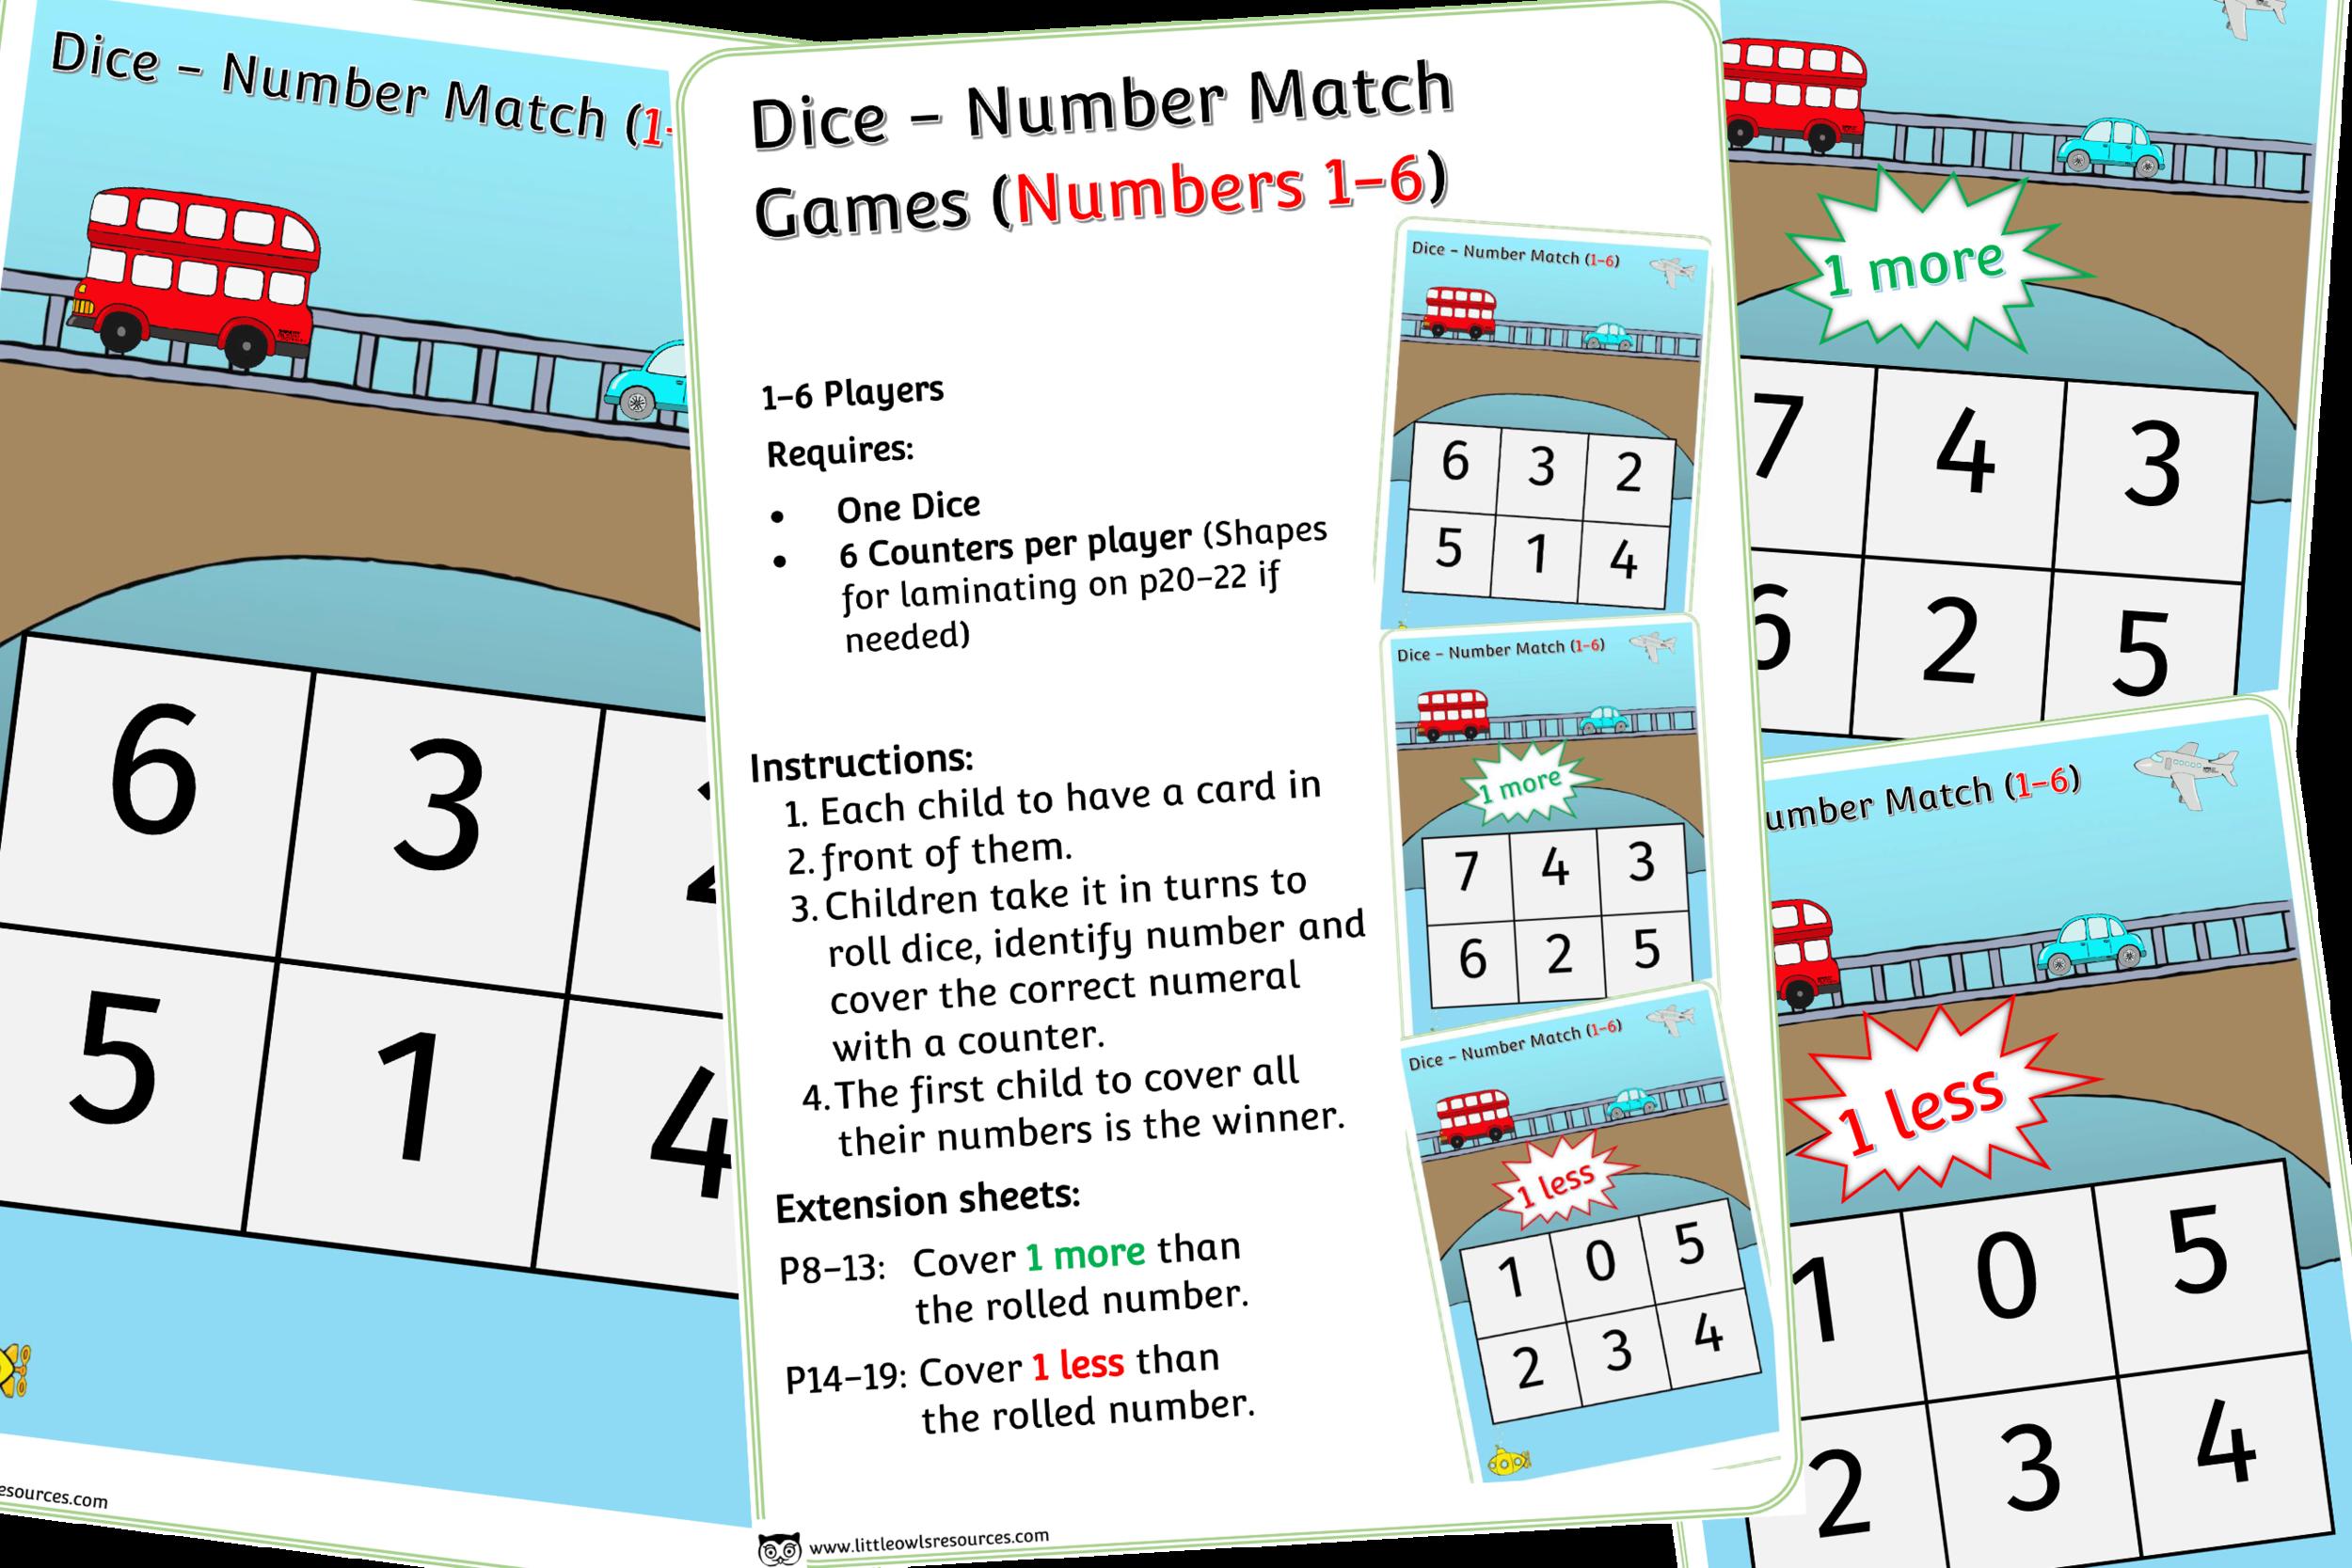 VEHICLES THEME DICE GAMES (1-6)